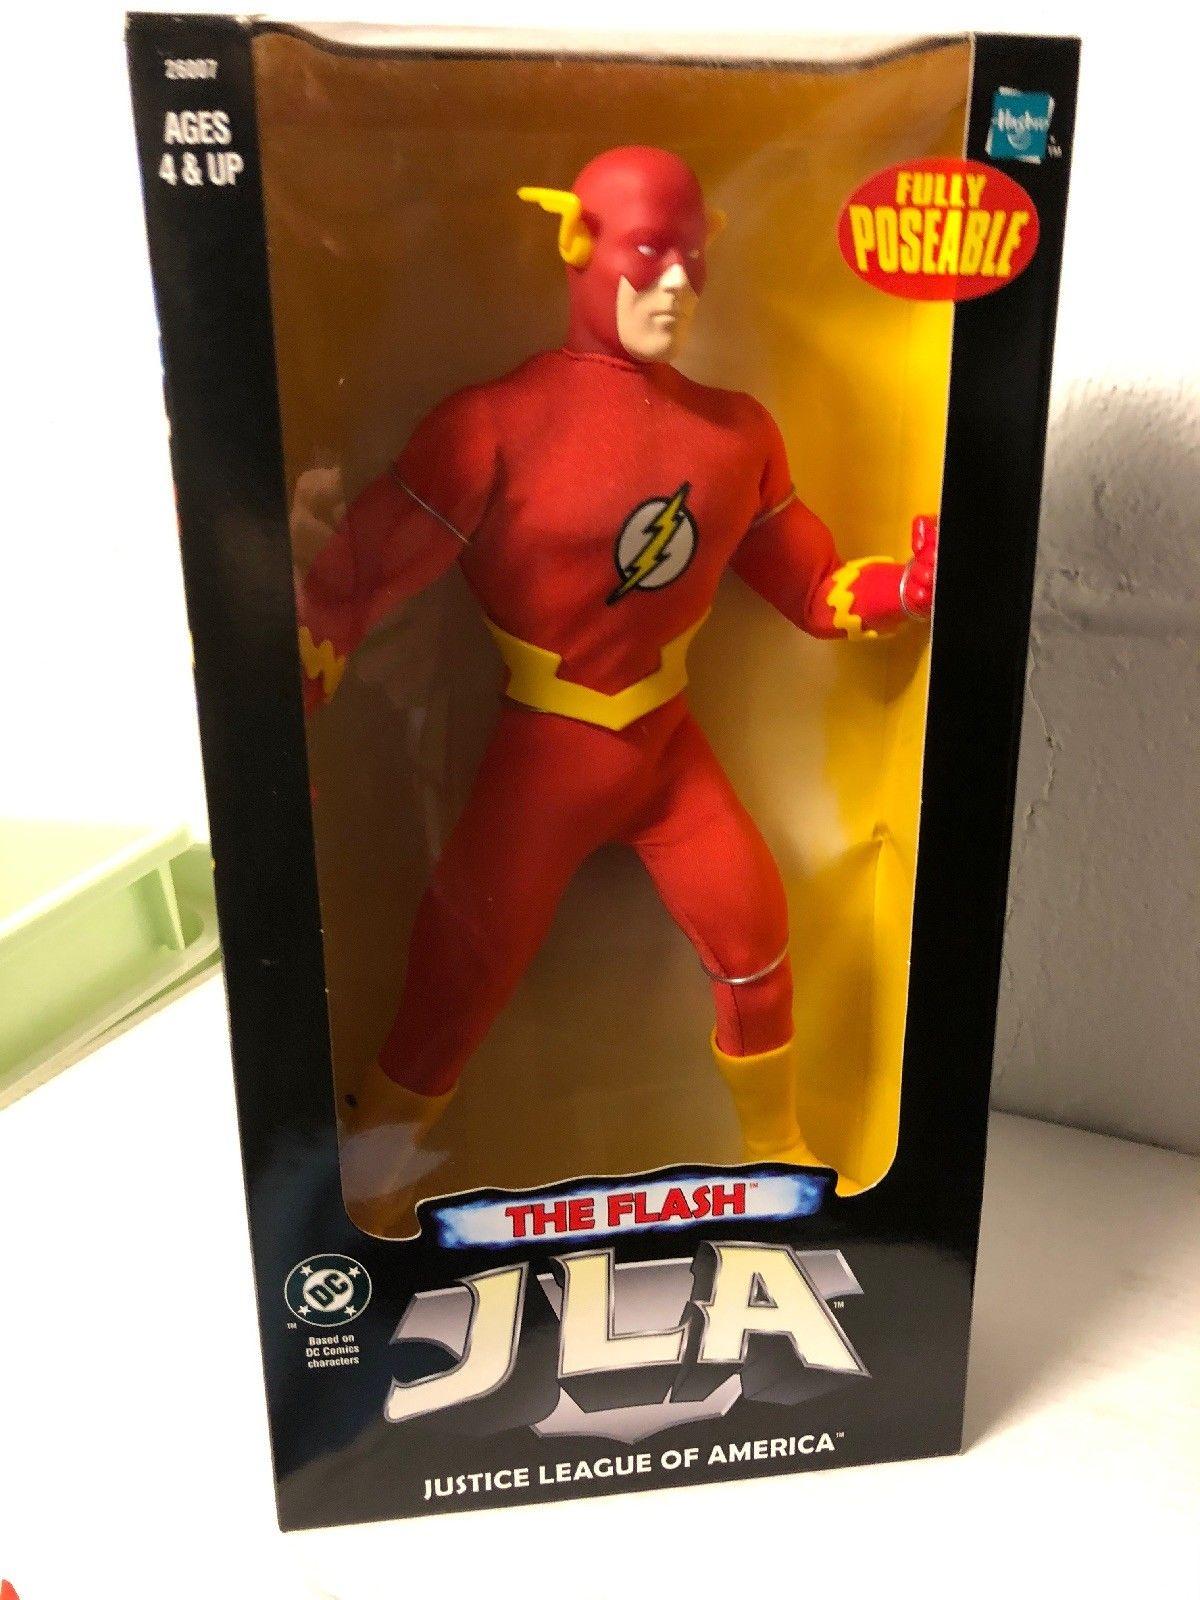 dc-jla-justice-league-of-america-the-flash.jpg